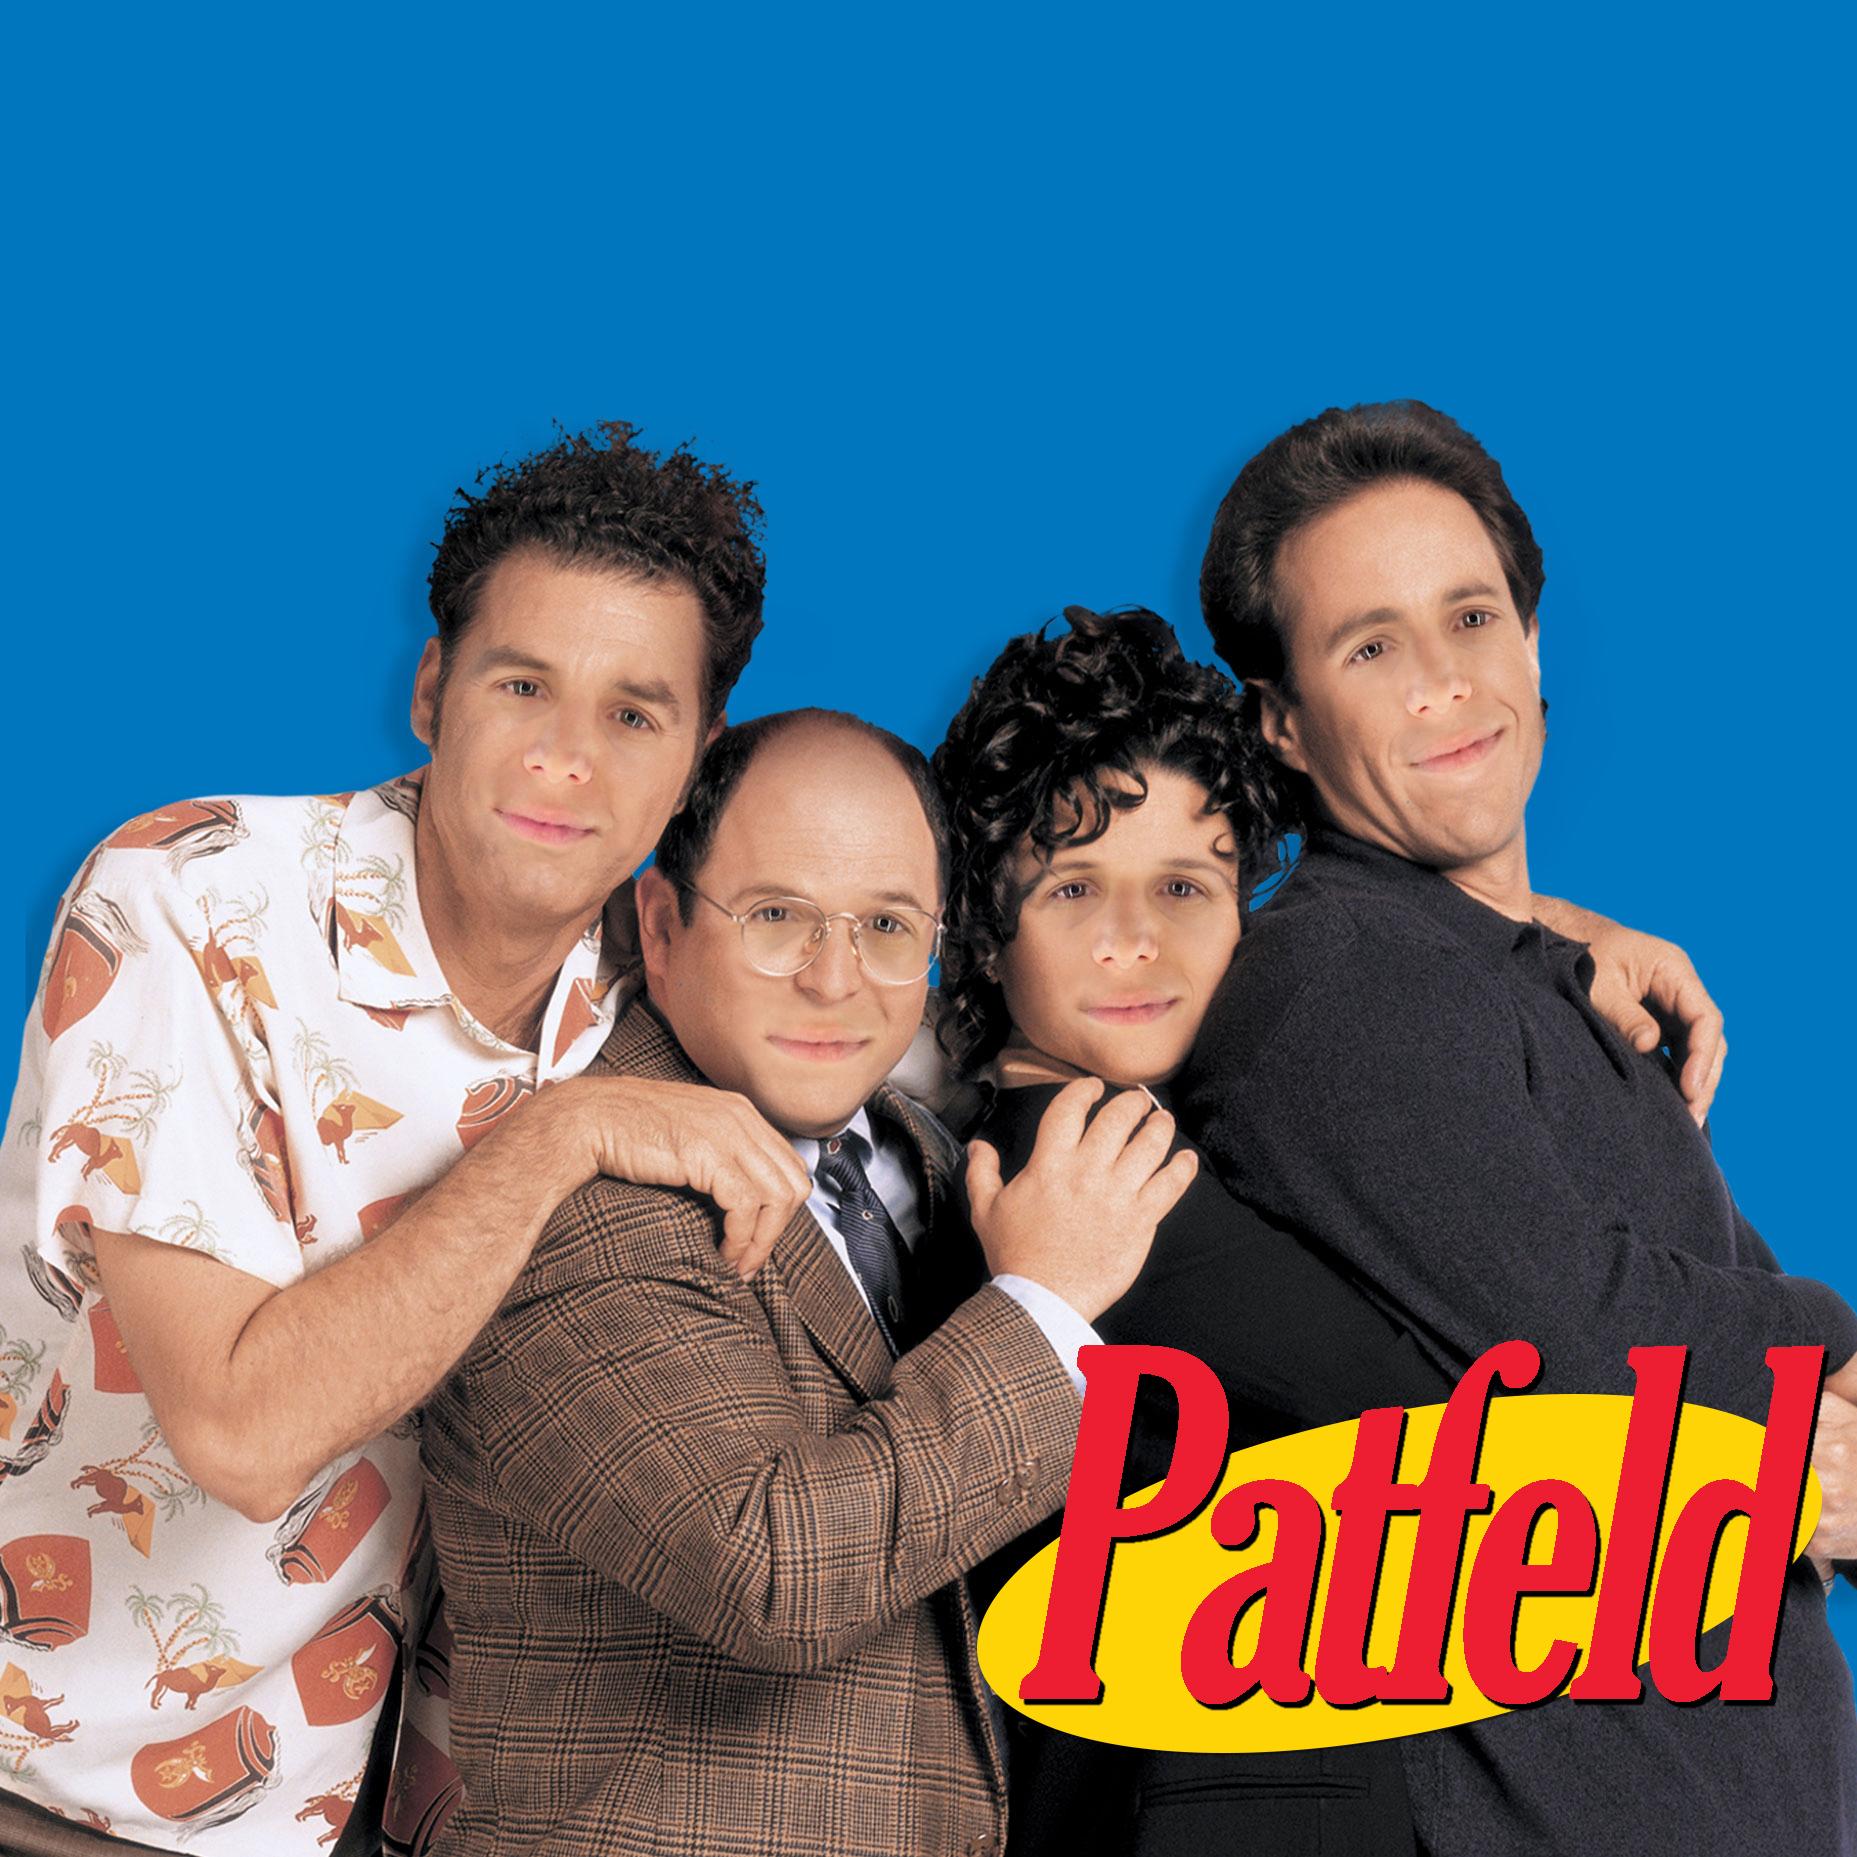 Patfeld.jpg